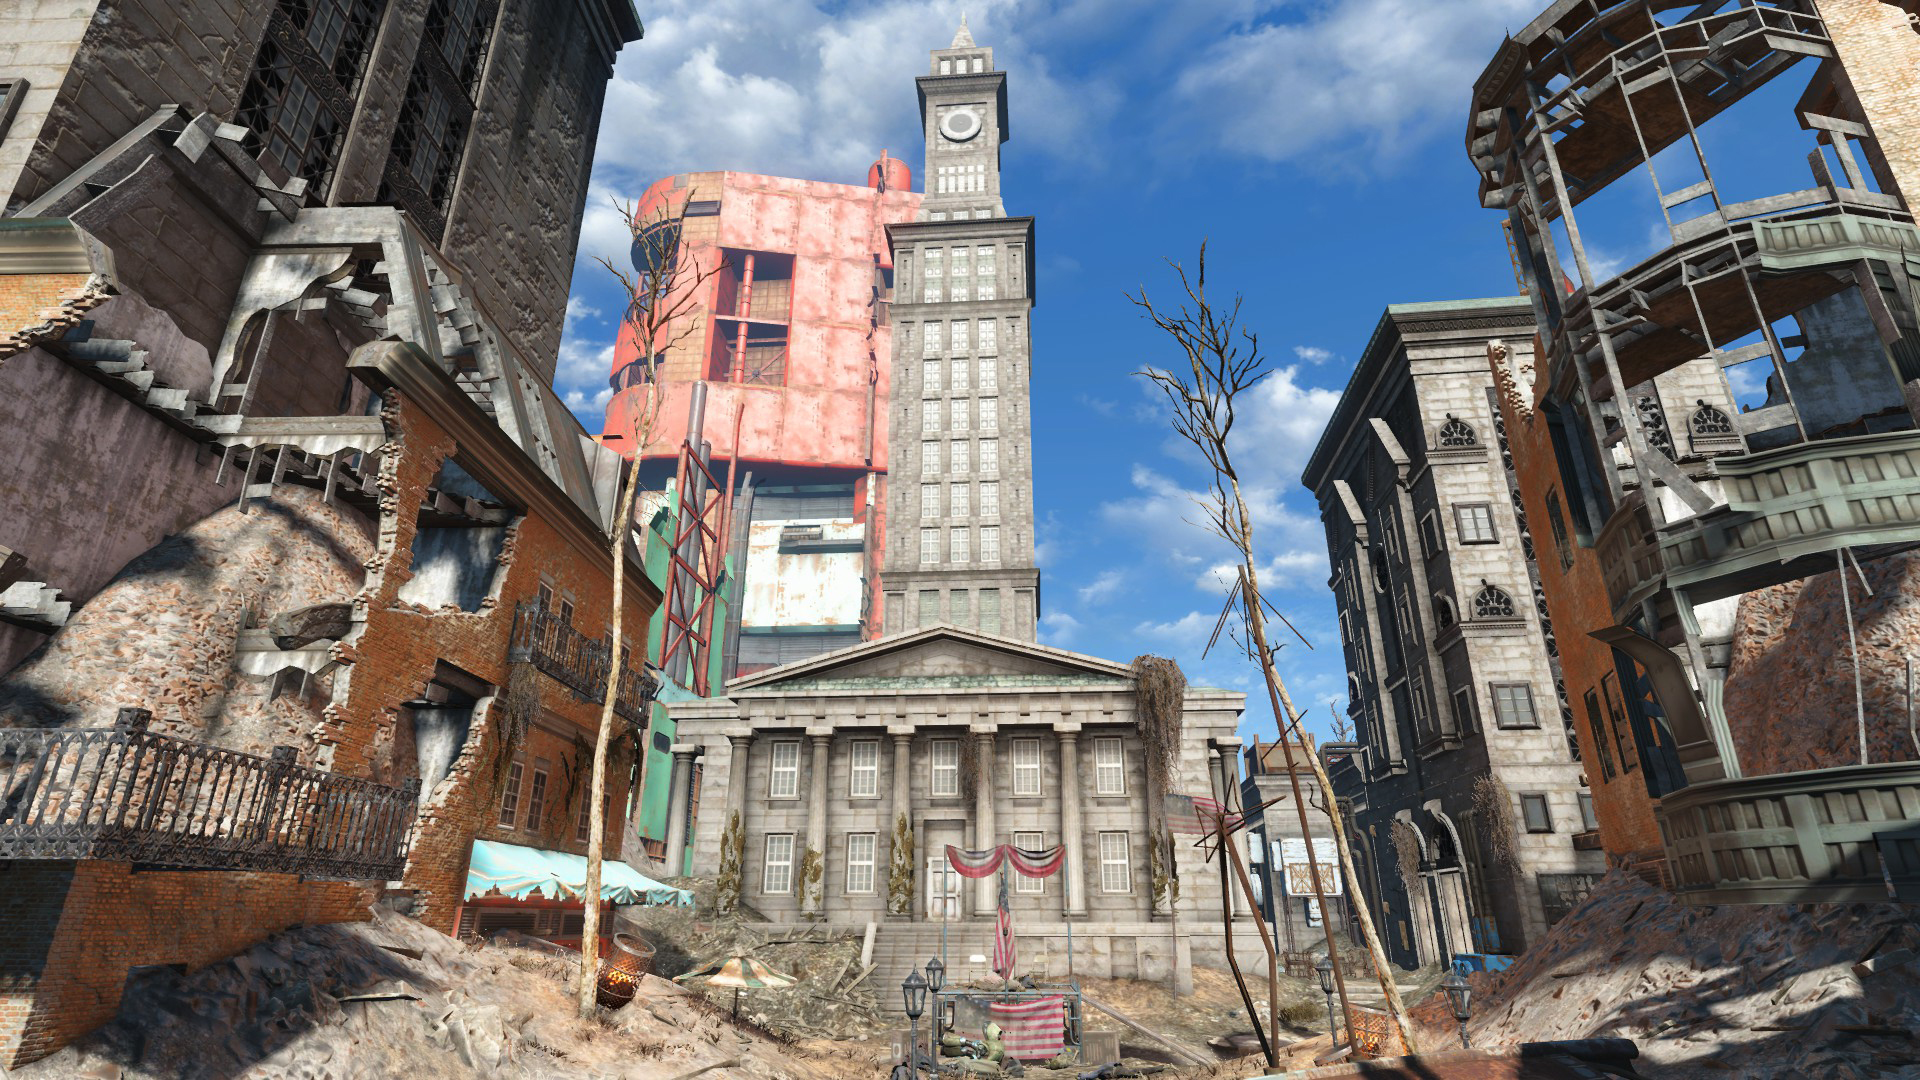 CustomHouseTower-Tower-Fallout4.jpg